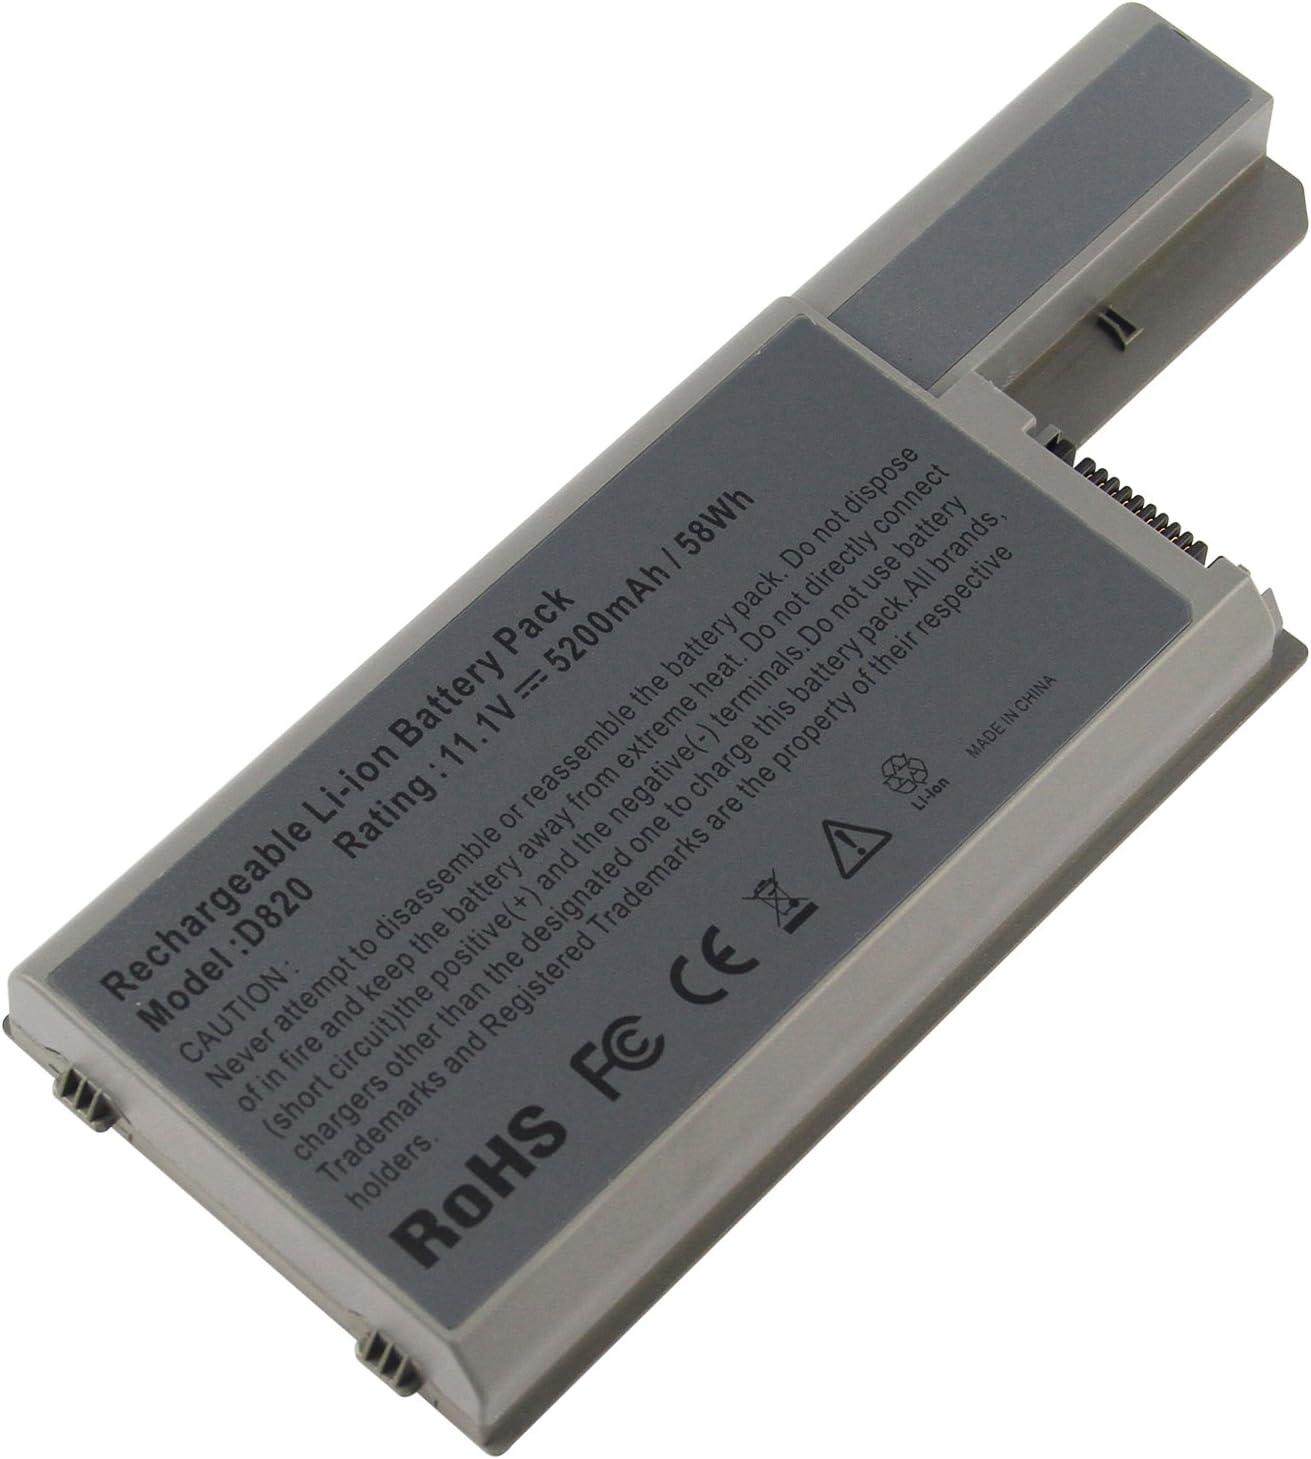 Futurebatt Laptop Battery for Dell Latitude D820 D830 D531 D531N Precision M65 M4300, fits 310-9122/310-9123/312-0393/312-0394/312-0401/312-0402/312-0537/312-0538/451-10308